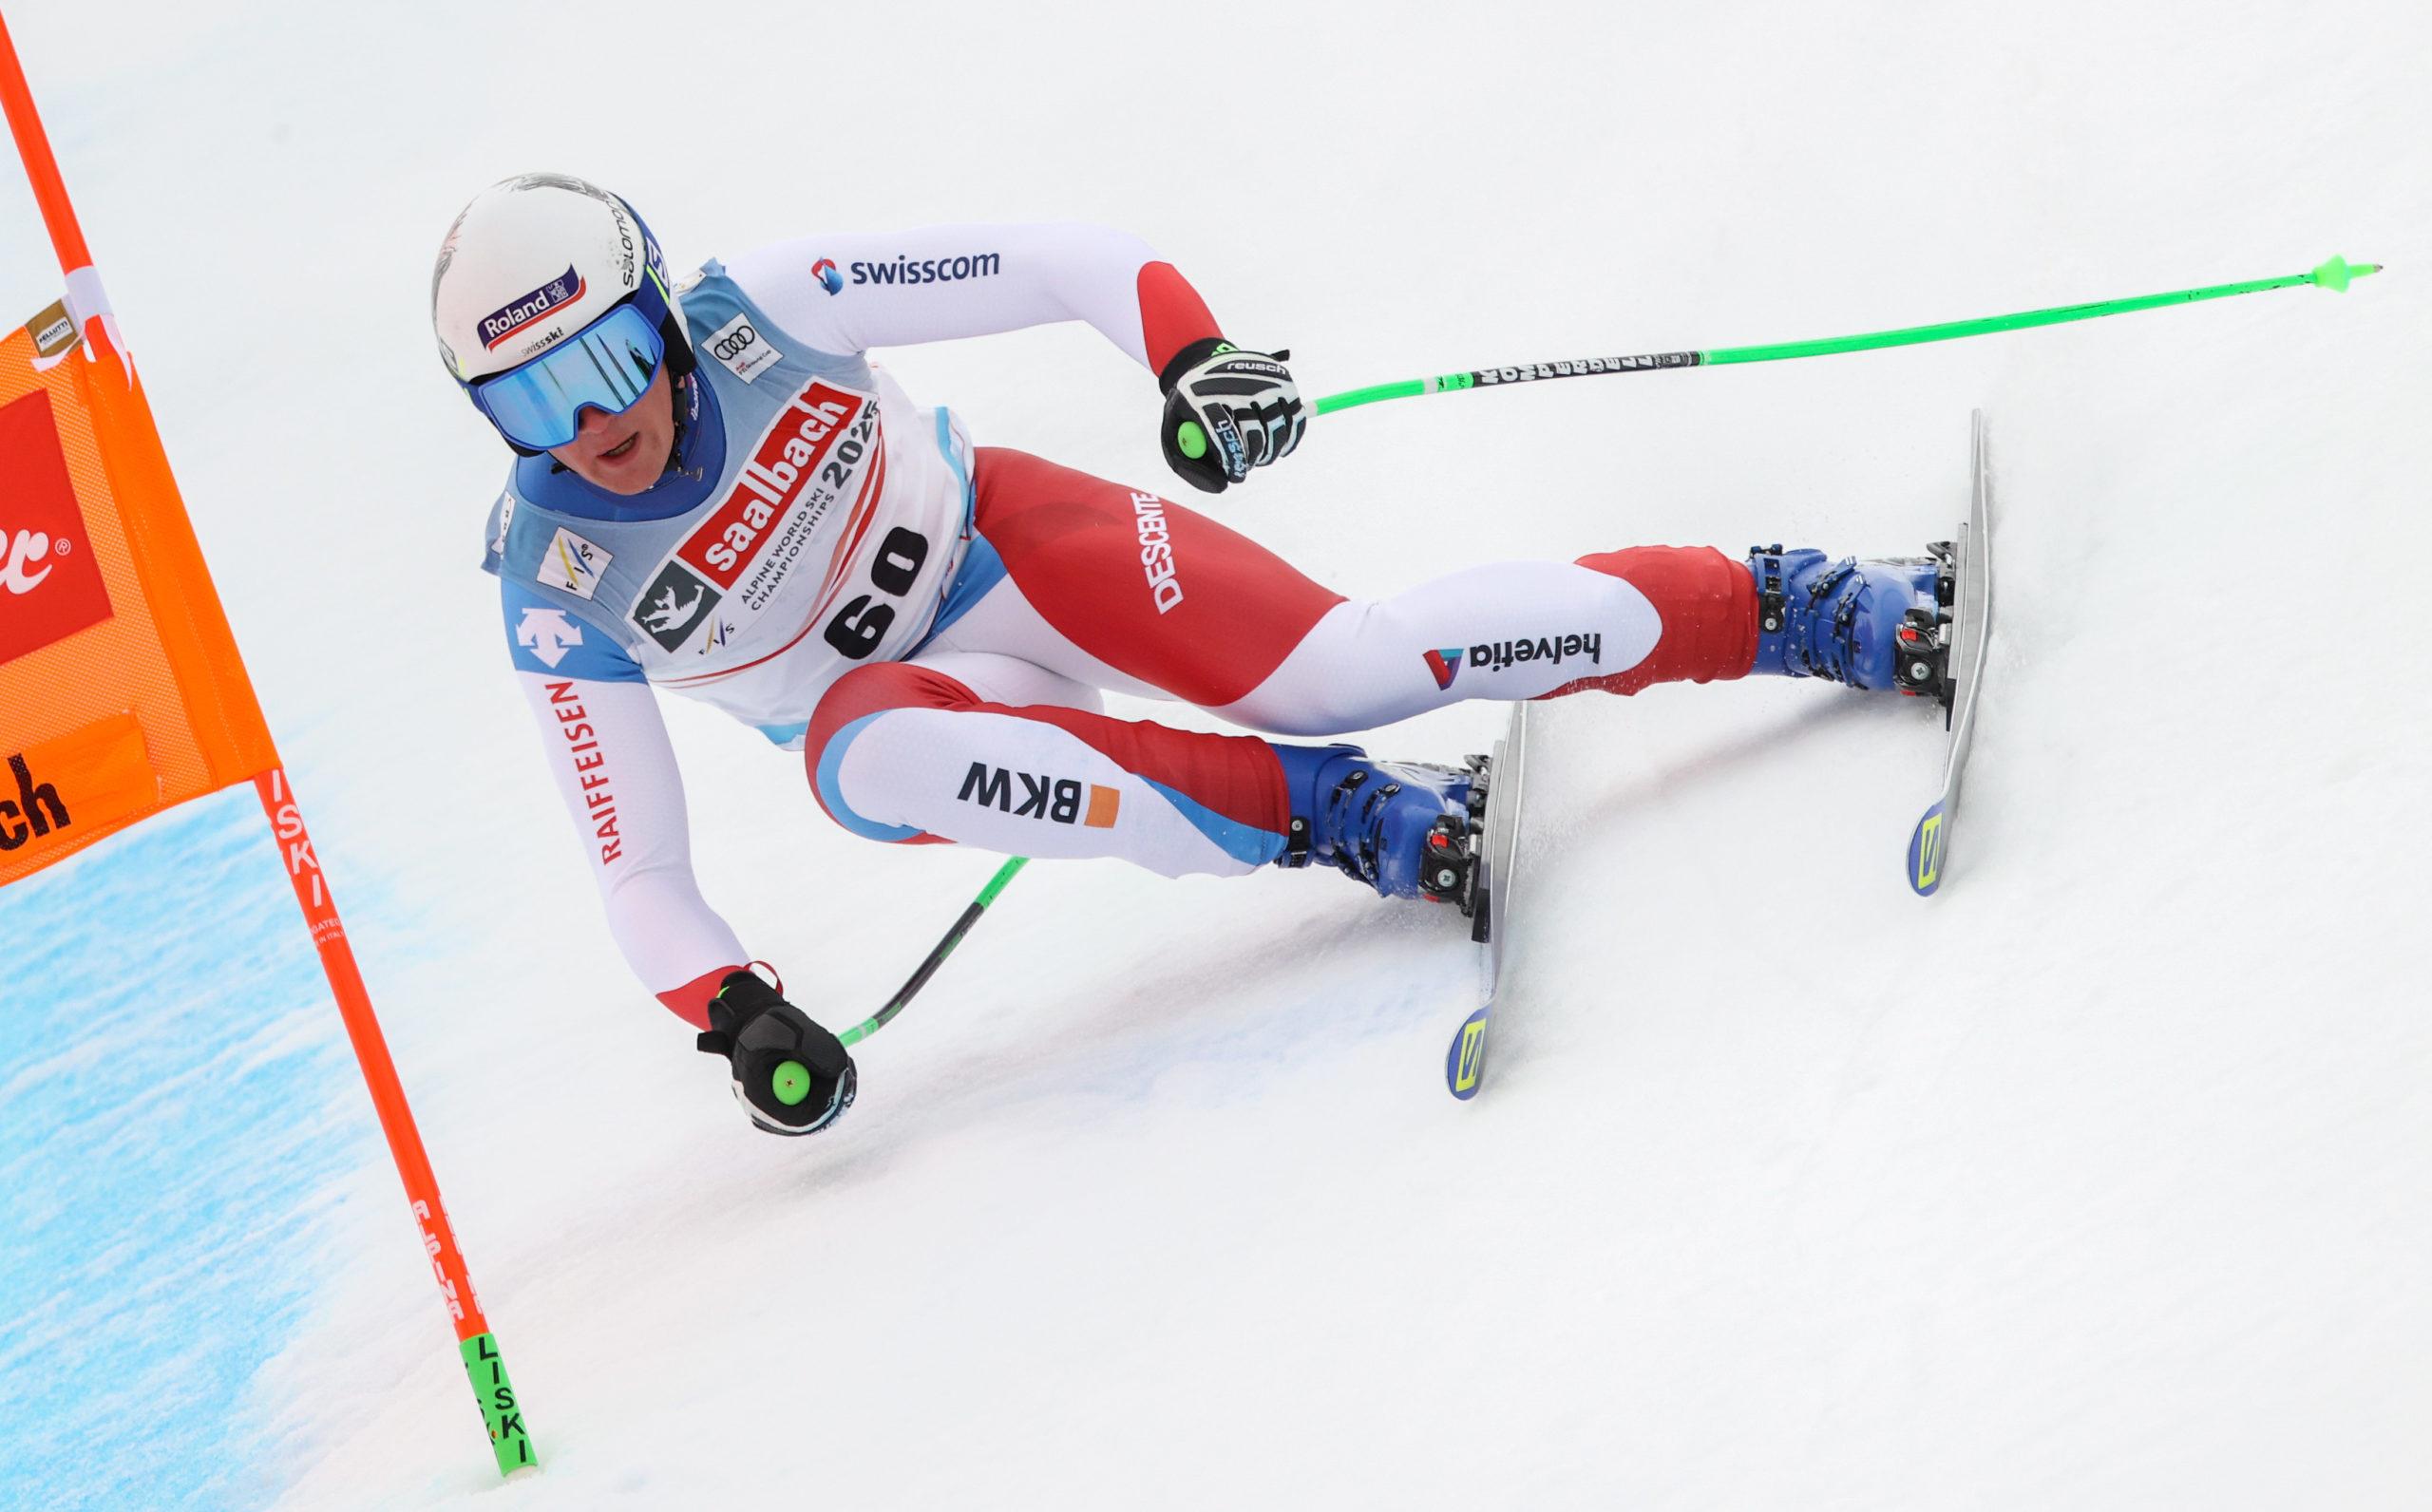 L'Après-Ski - saison 2 : Arnaud Boisset